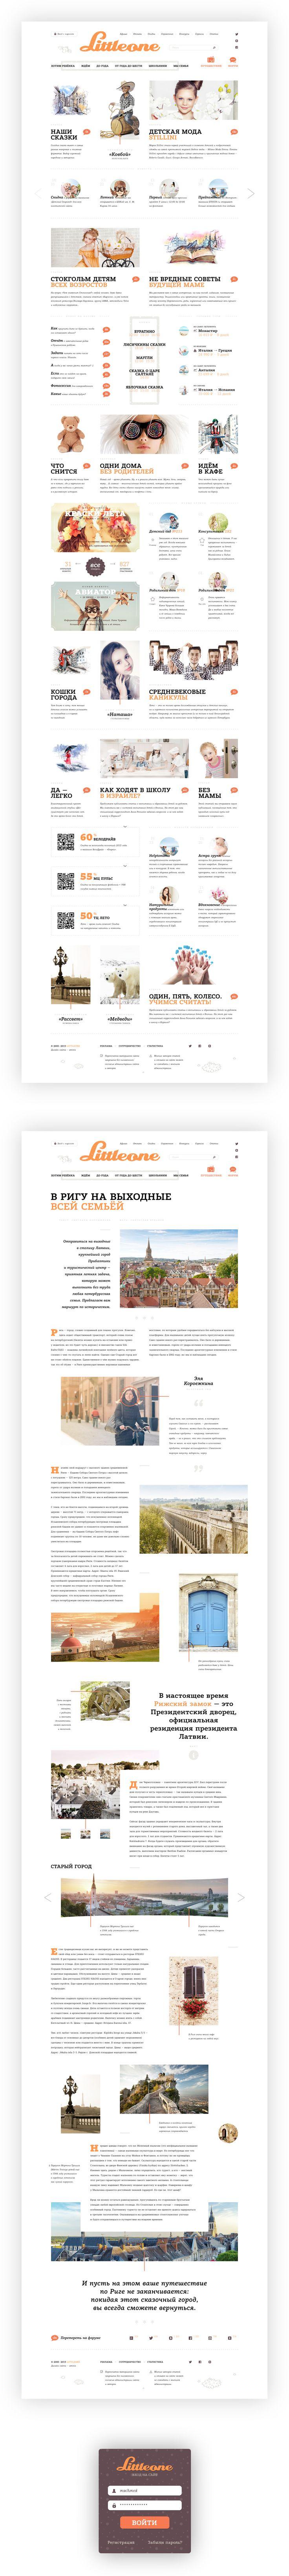 Littleone, Сайт © Андрей Жуков